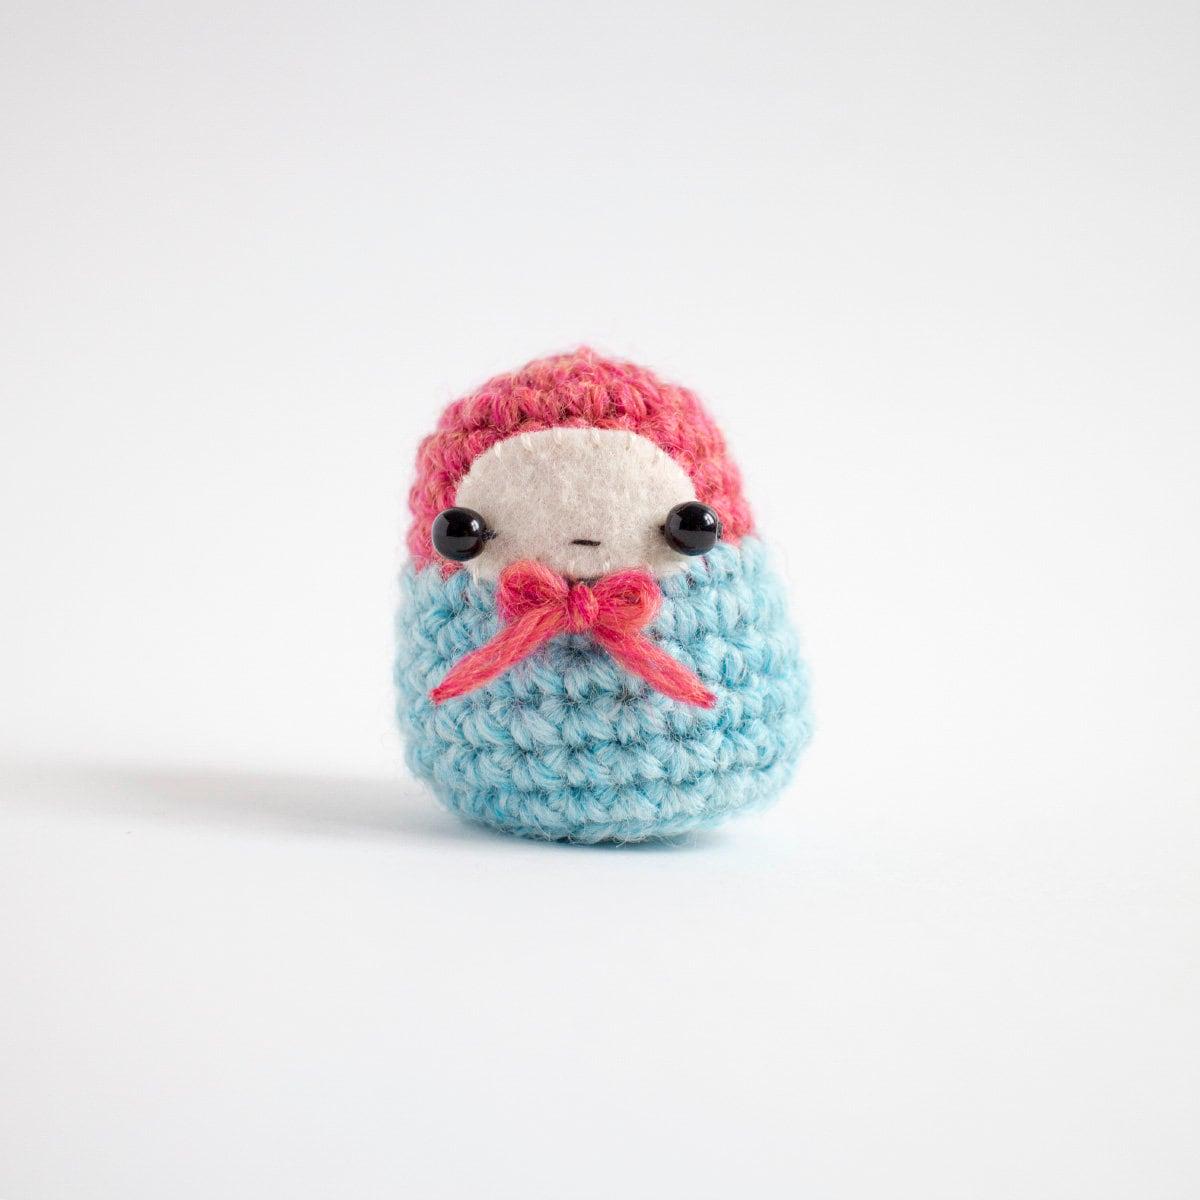 Ravelry: LALALOOPSY Peggy Seven Seas Crochet Amigurumi Doll ... | 1200x1200